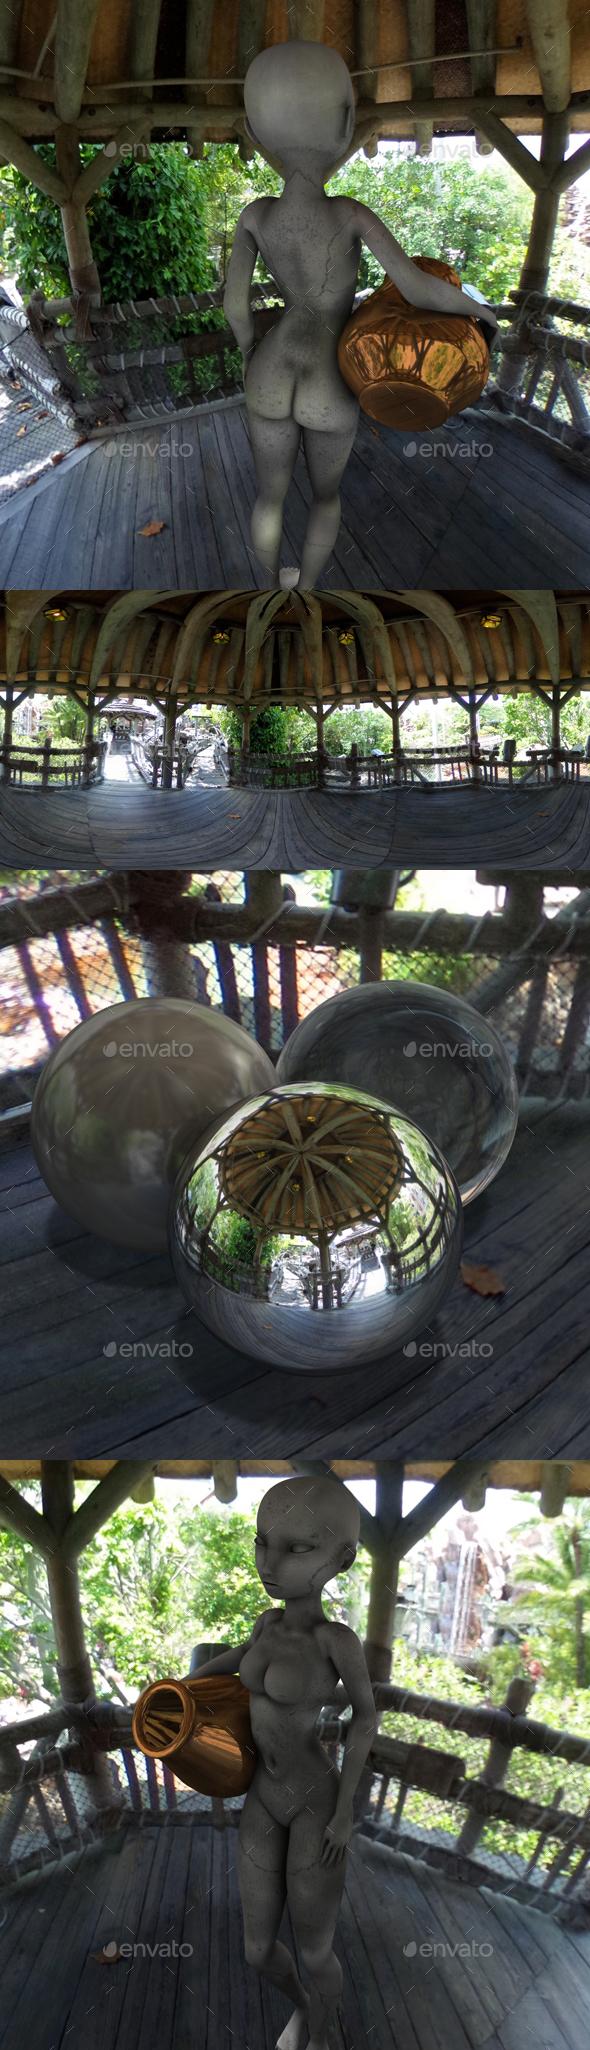 Jungle Hut Outlook HDRI - 3DOcean Item for Sale